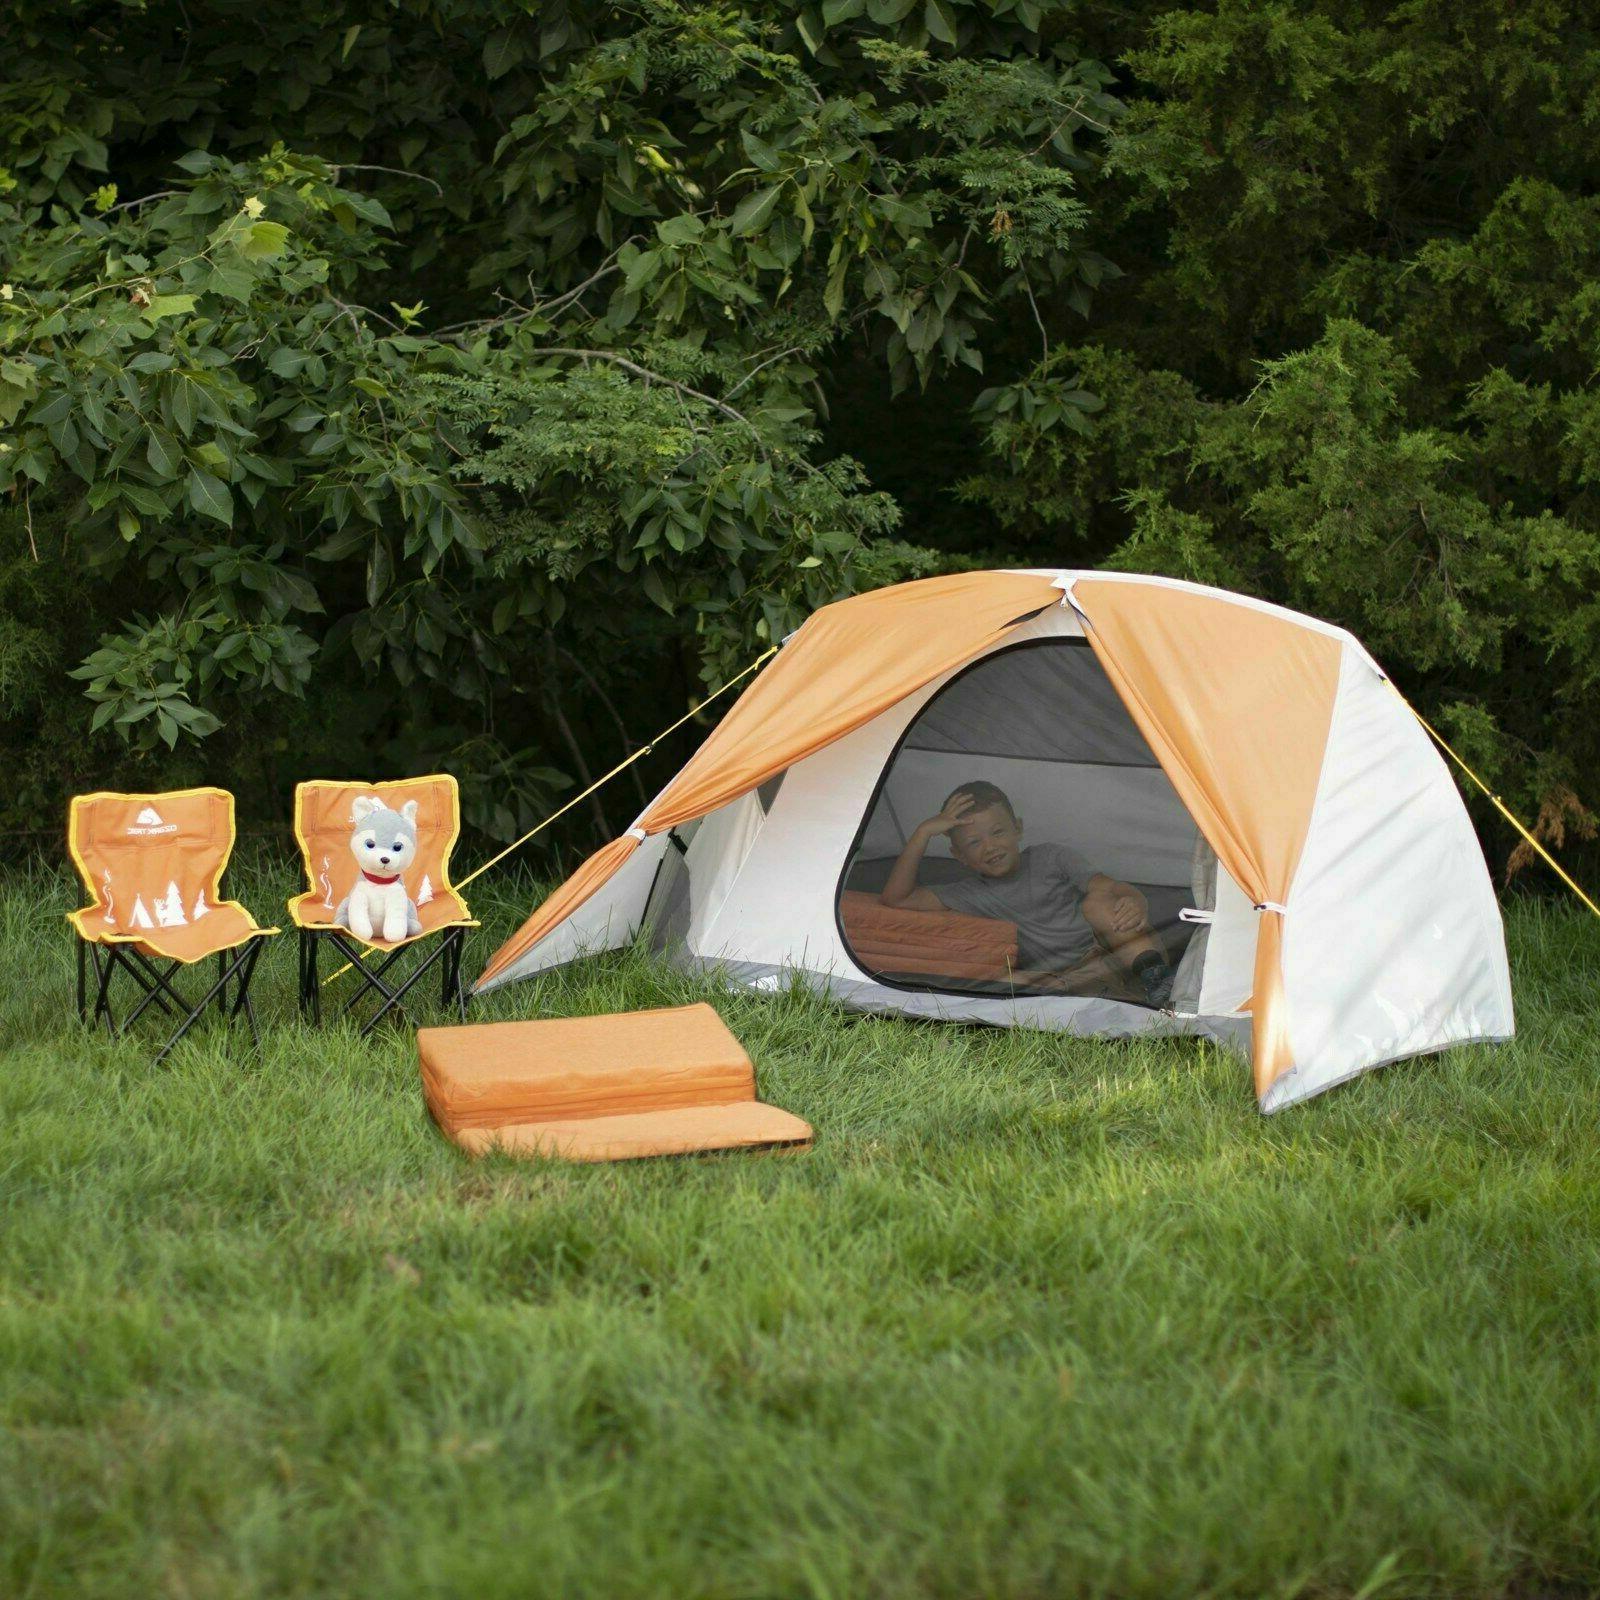 Kids Outdoor Kit Explorer Toys Set Exploration